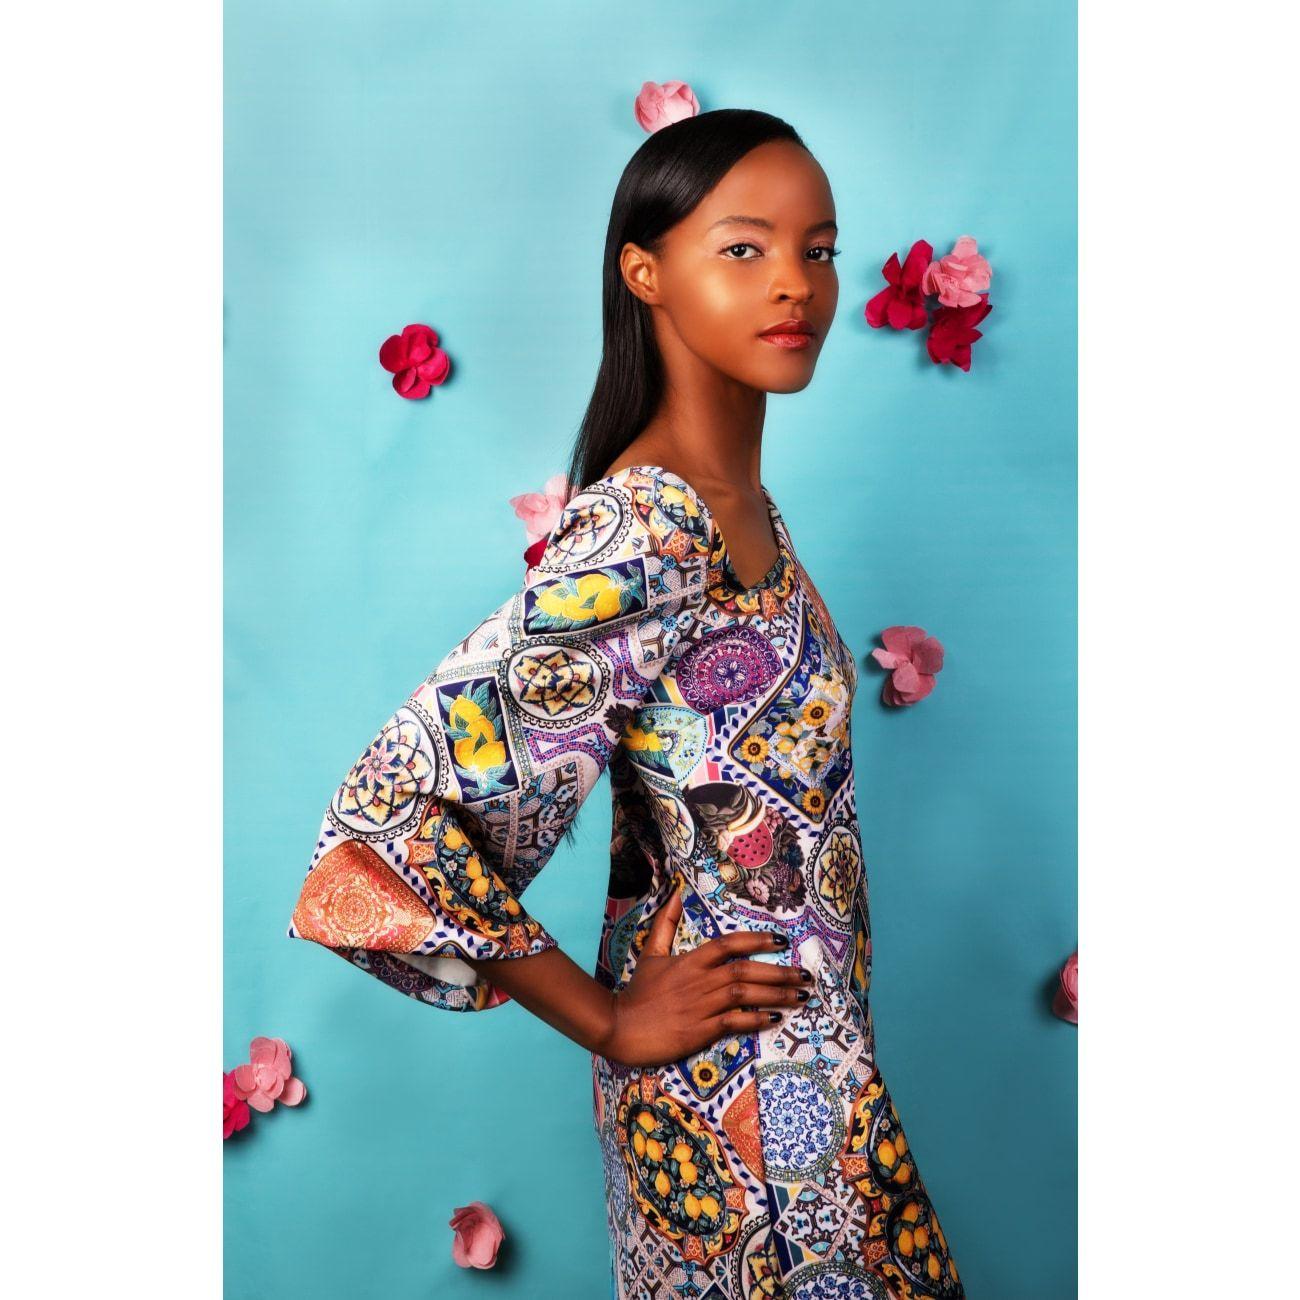 e99cd325d9d12 Minara Dress | Products | Pinterest | Dresses, Baby shower dresses ...